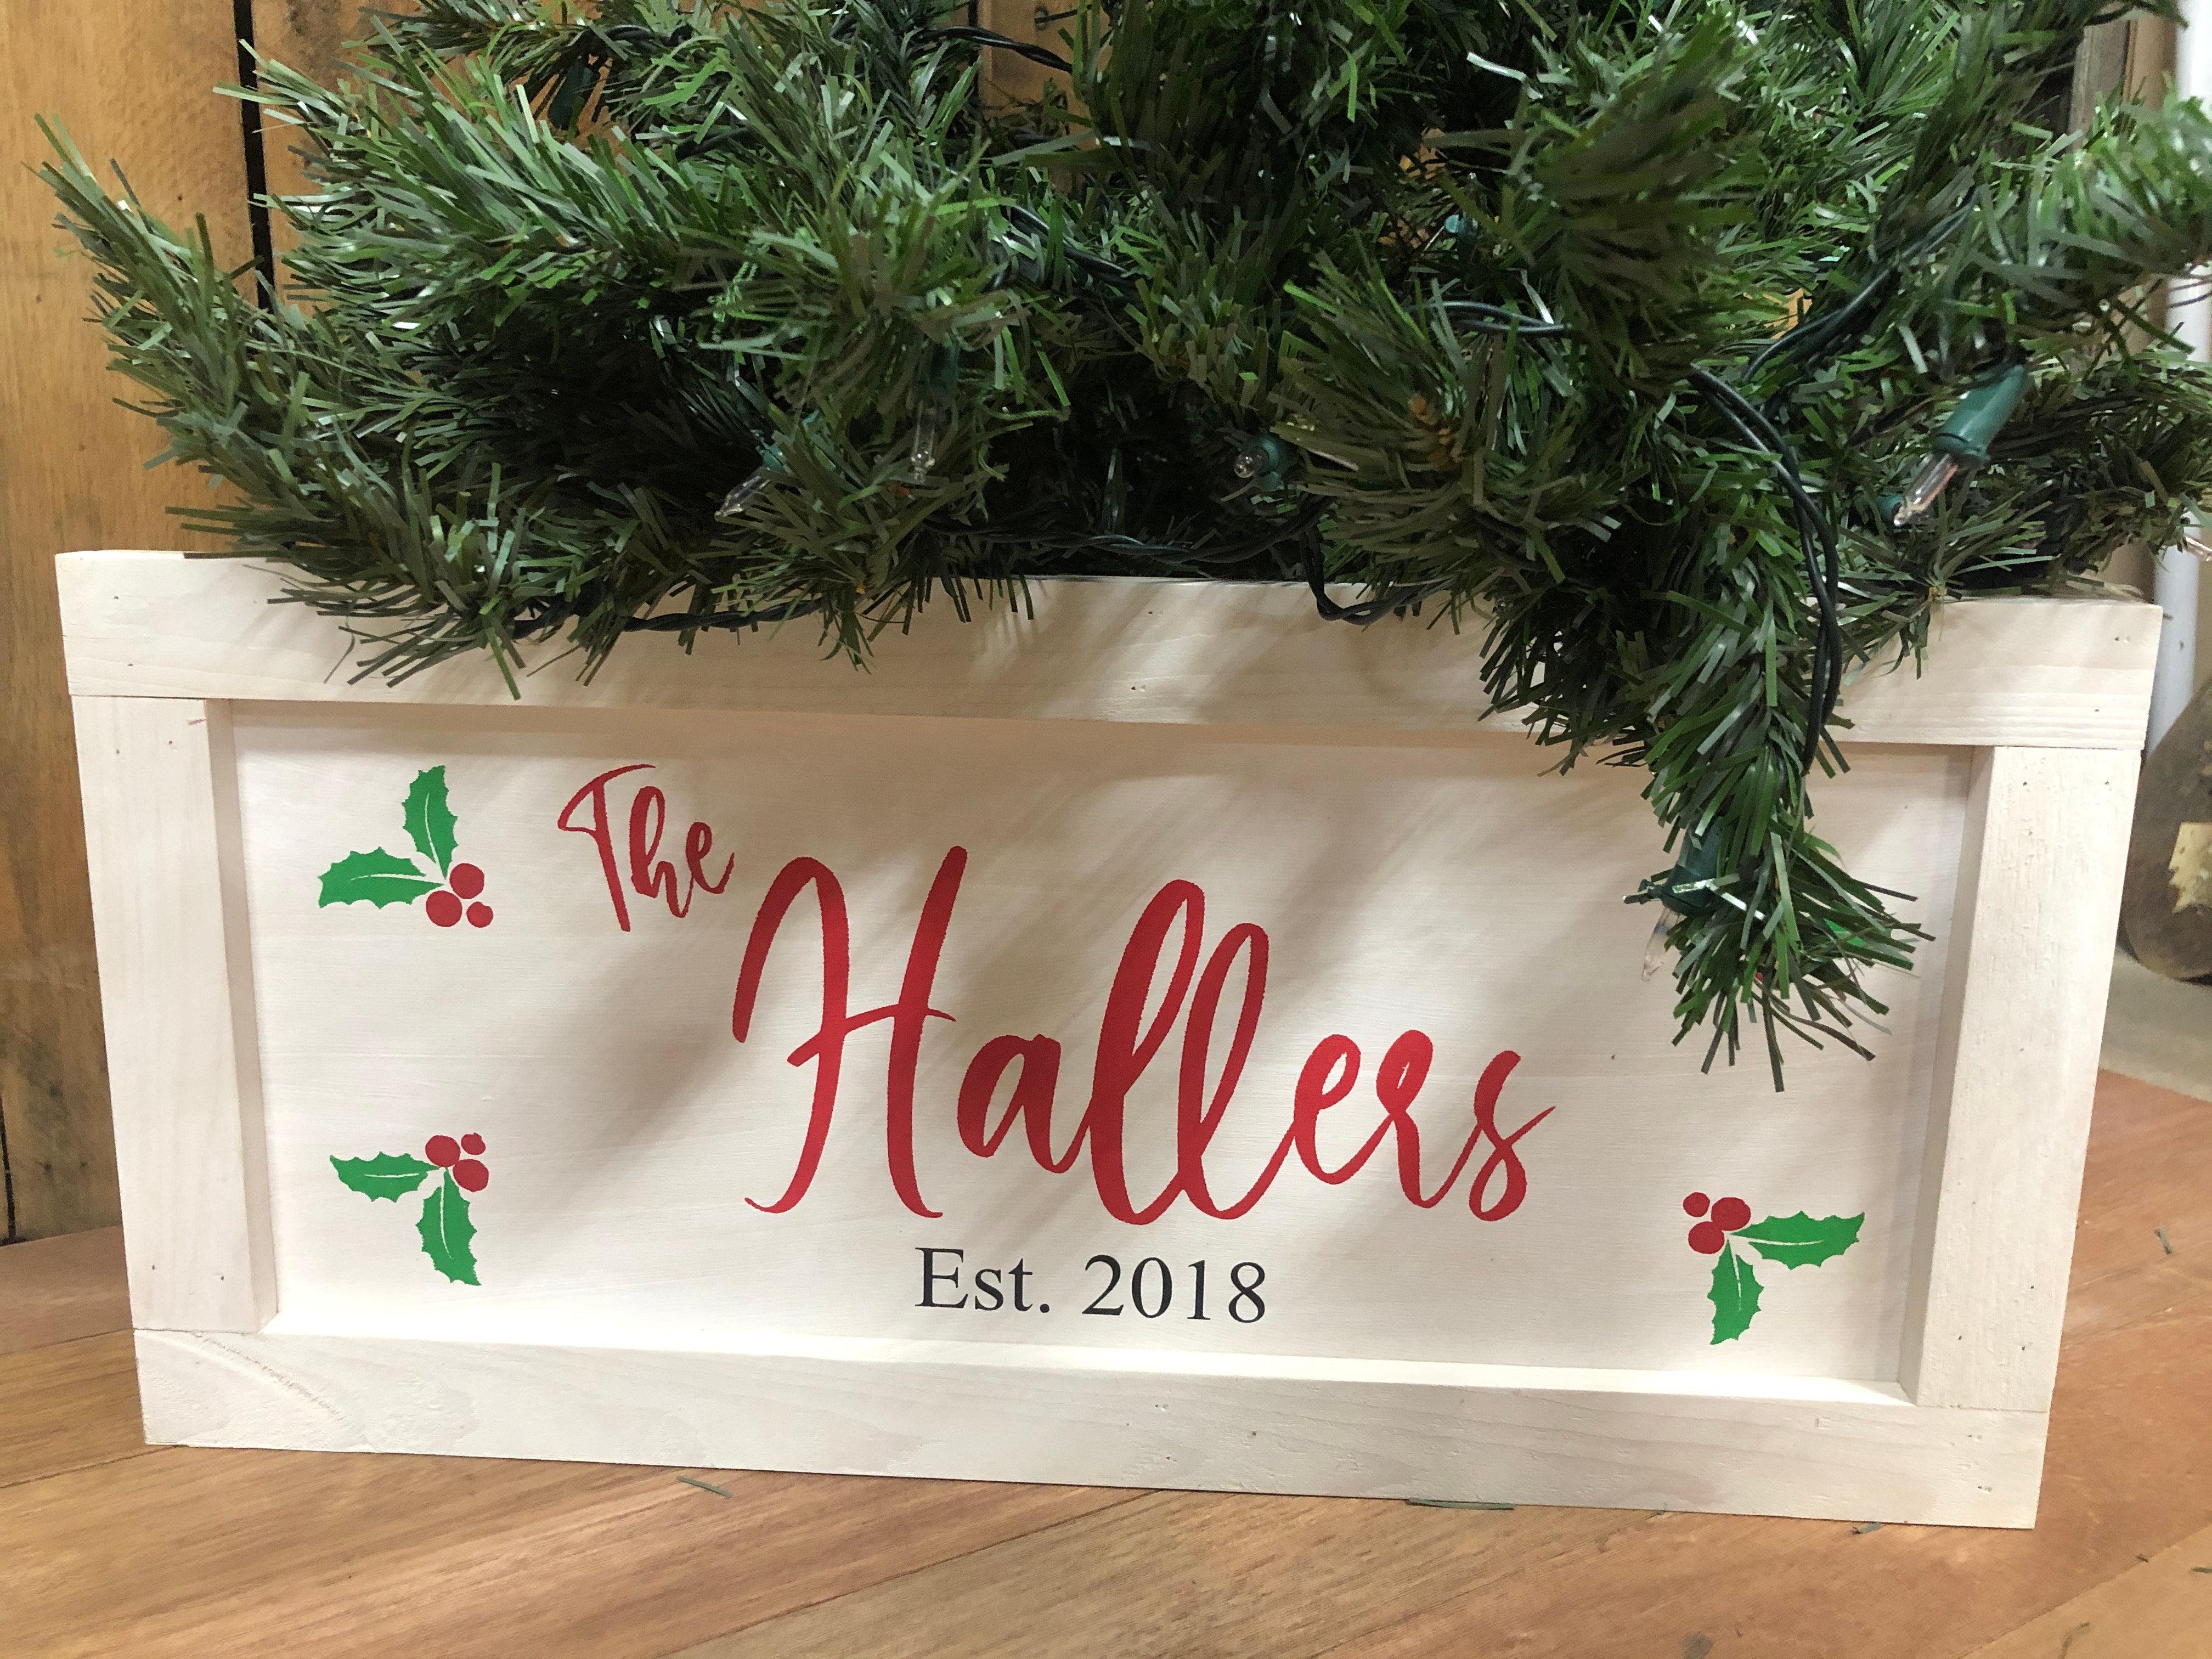 Christmas Tree Collar Ddt Home Goods